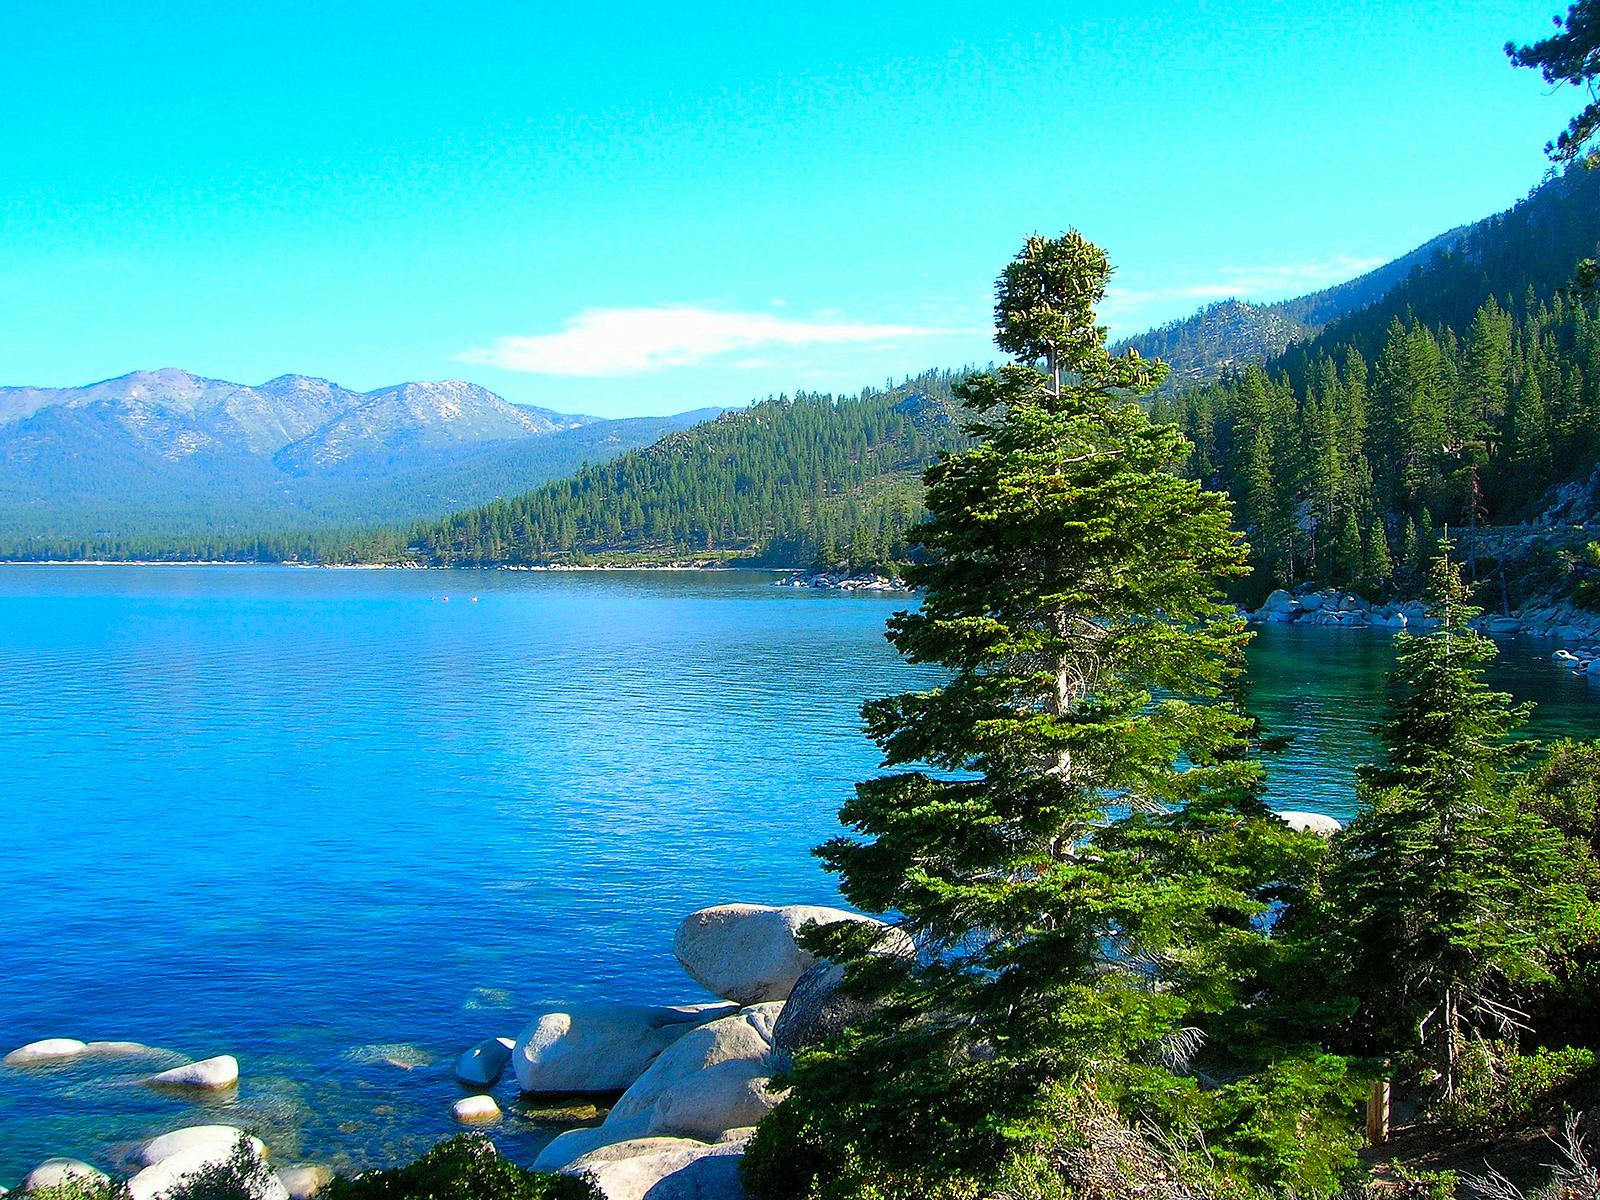 Lake Tahoe California Nevada HD Wallpapers - Top HD Wallpapers